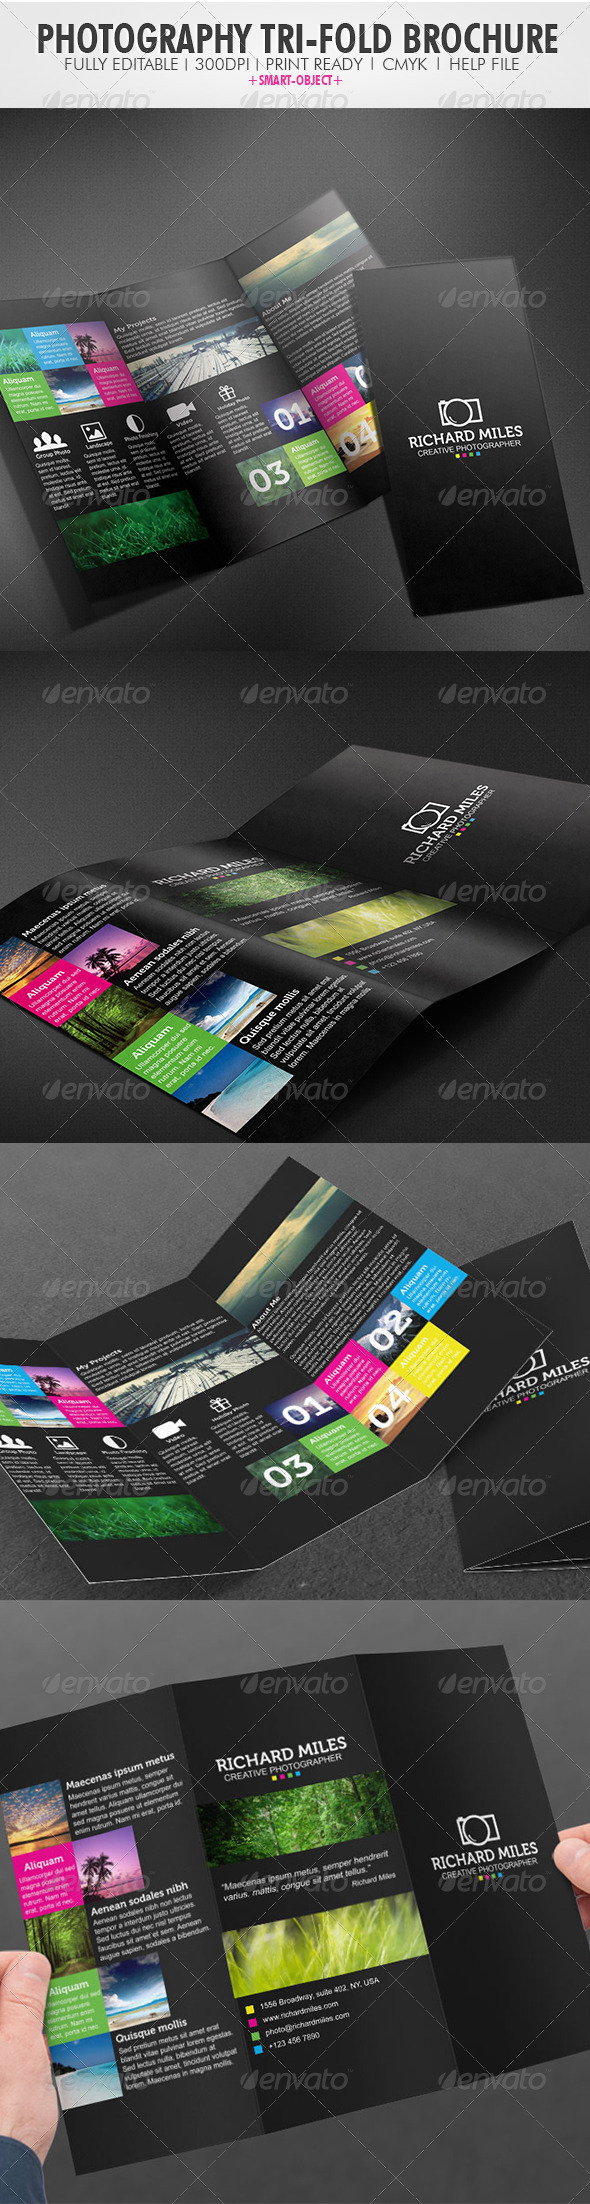 Photography Tri-fold Brochure - Portfolio Brochures